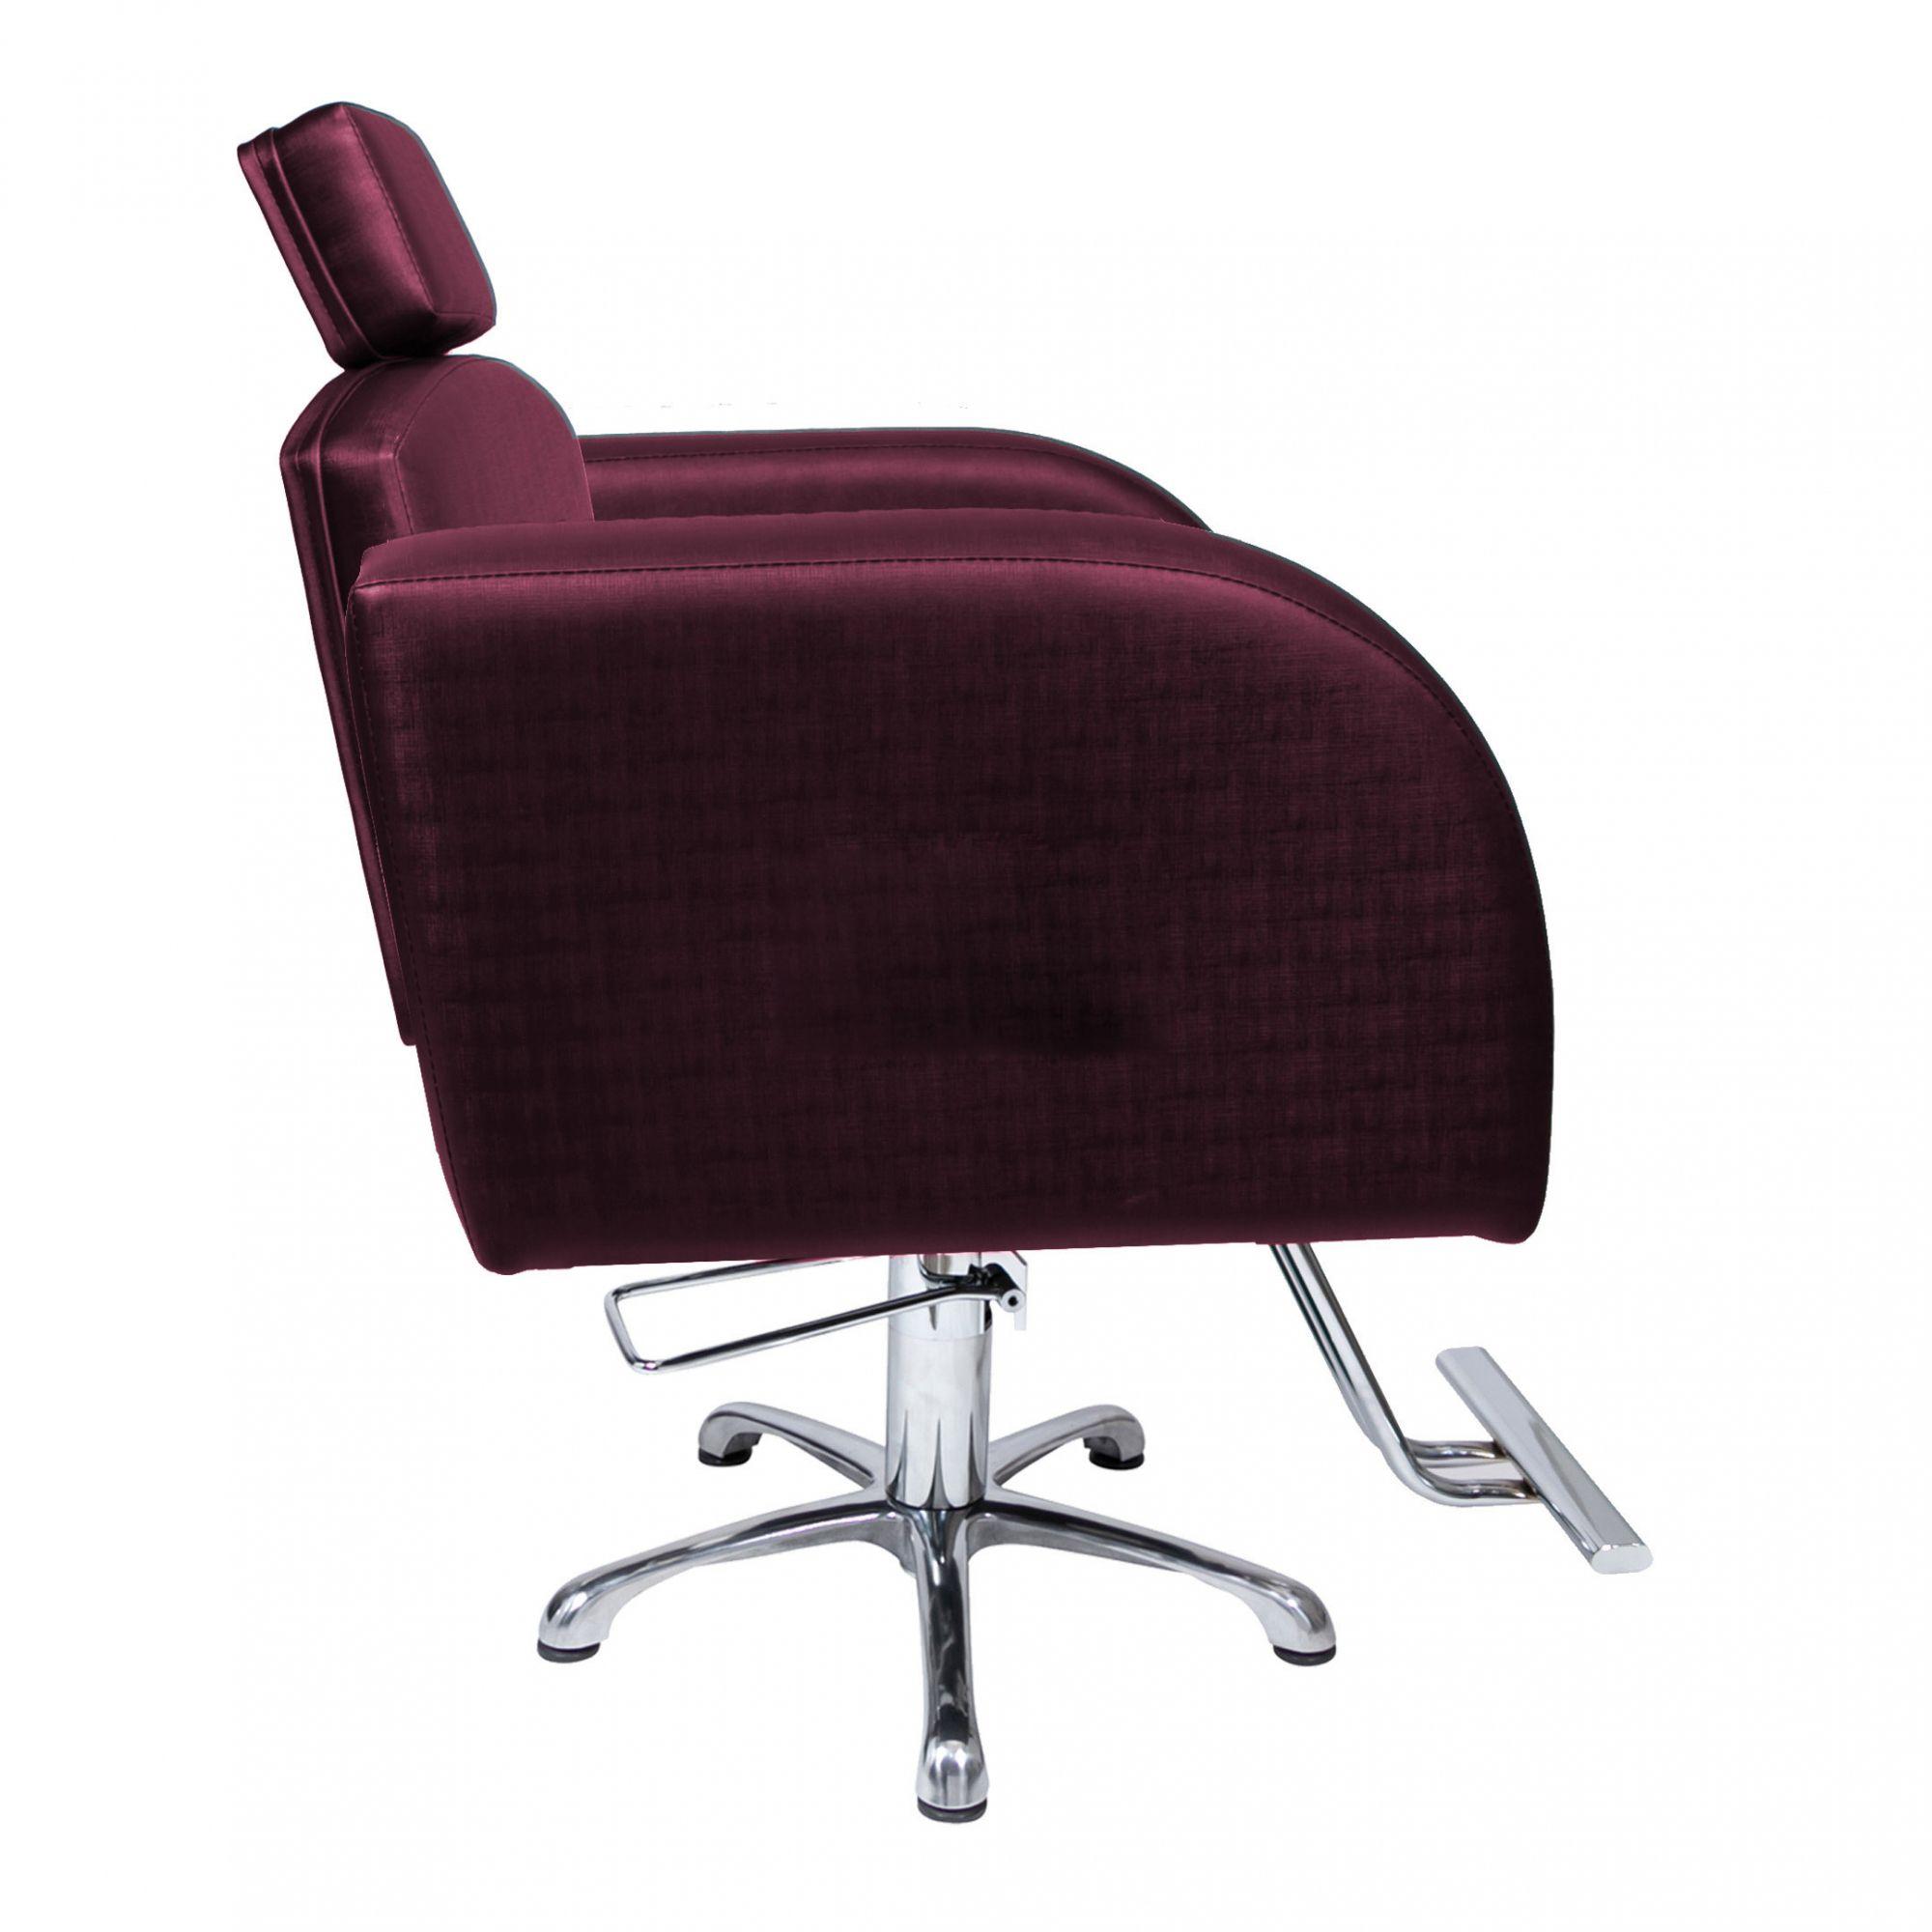 Destak Bordo - Lavatorio + 2 Cadeiras Fixas